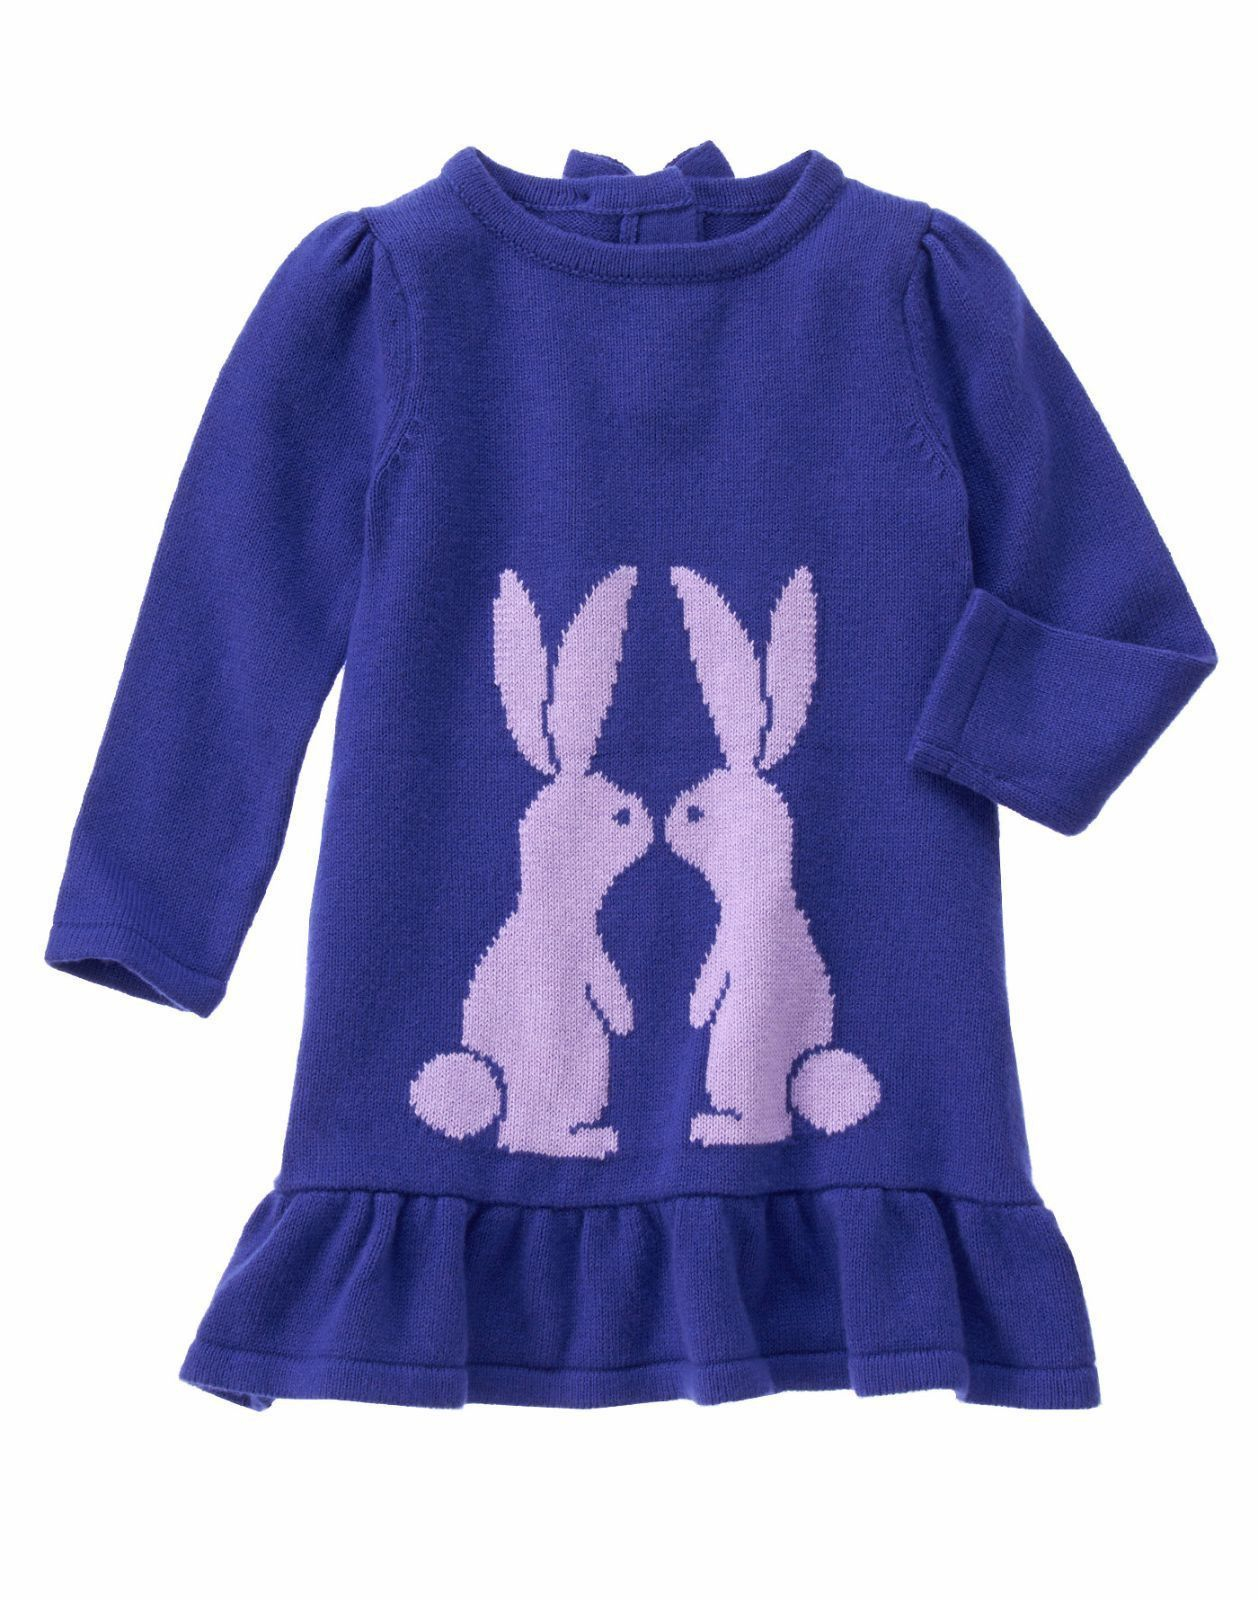 8b0671f27 GYMBOREE Baby Girls Purple Easter Bunny Rabbit Long Sleeve Sweater ...